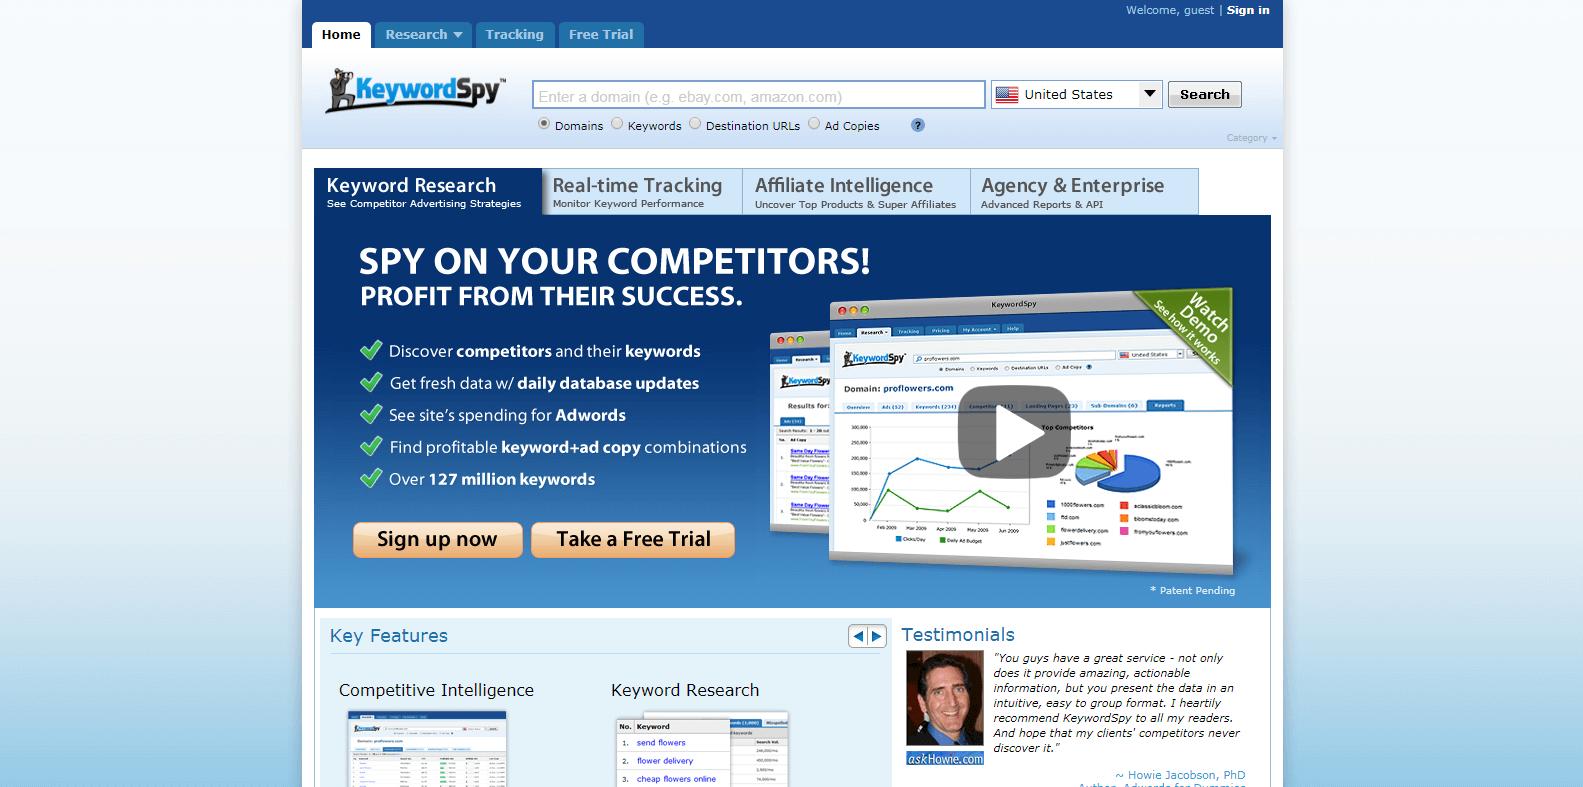 KeywordSpy Competitor Analysis Tools